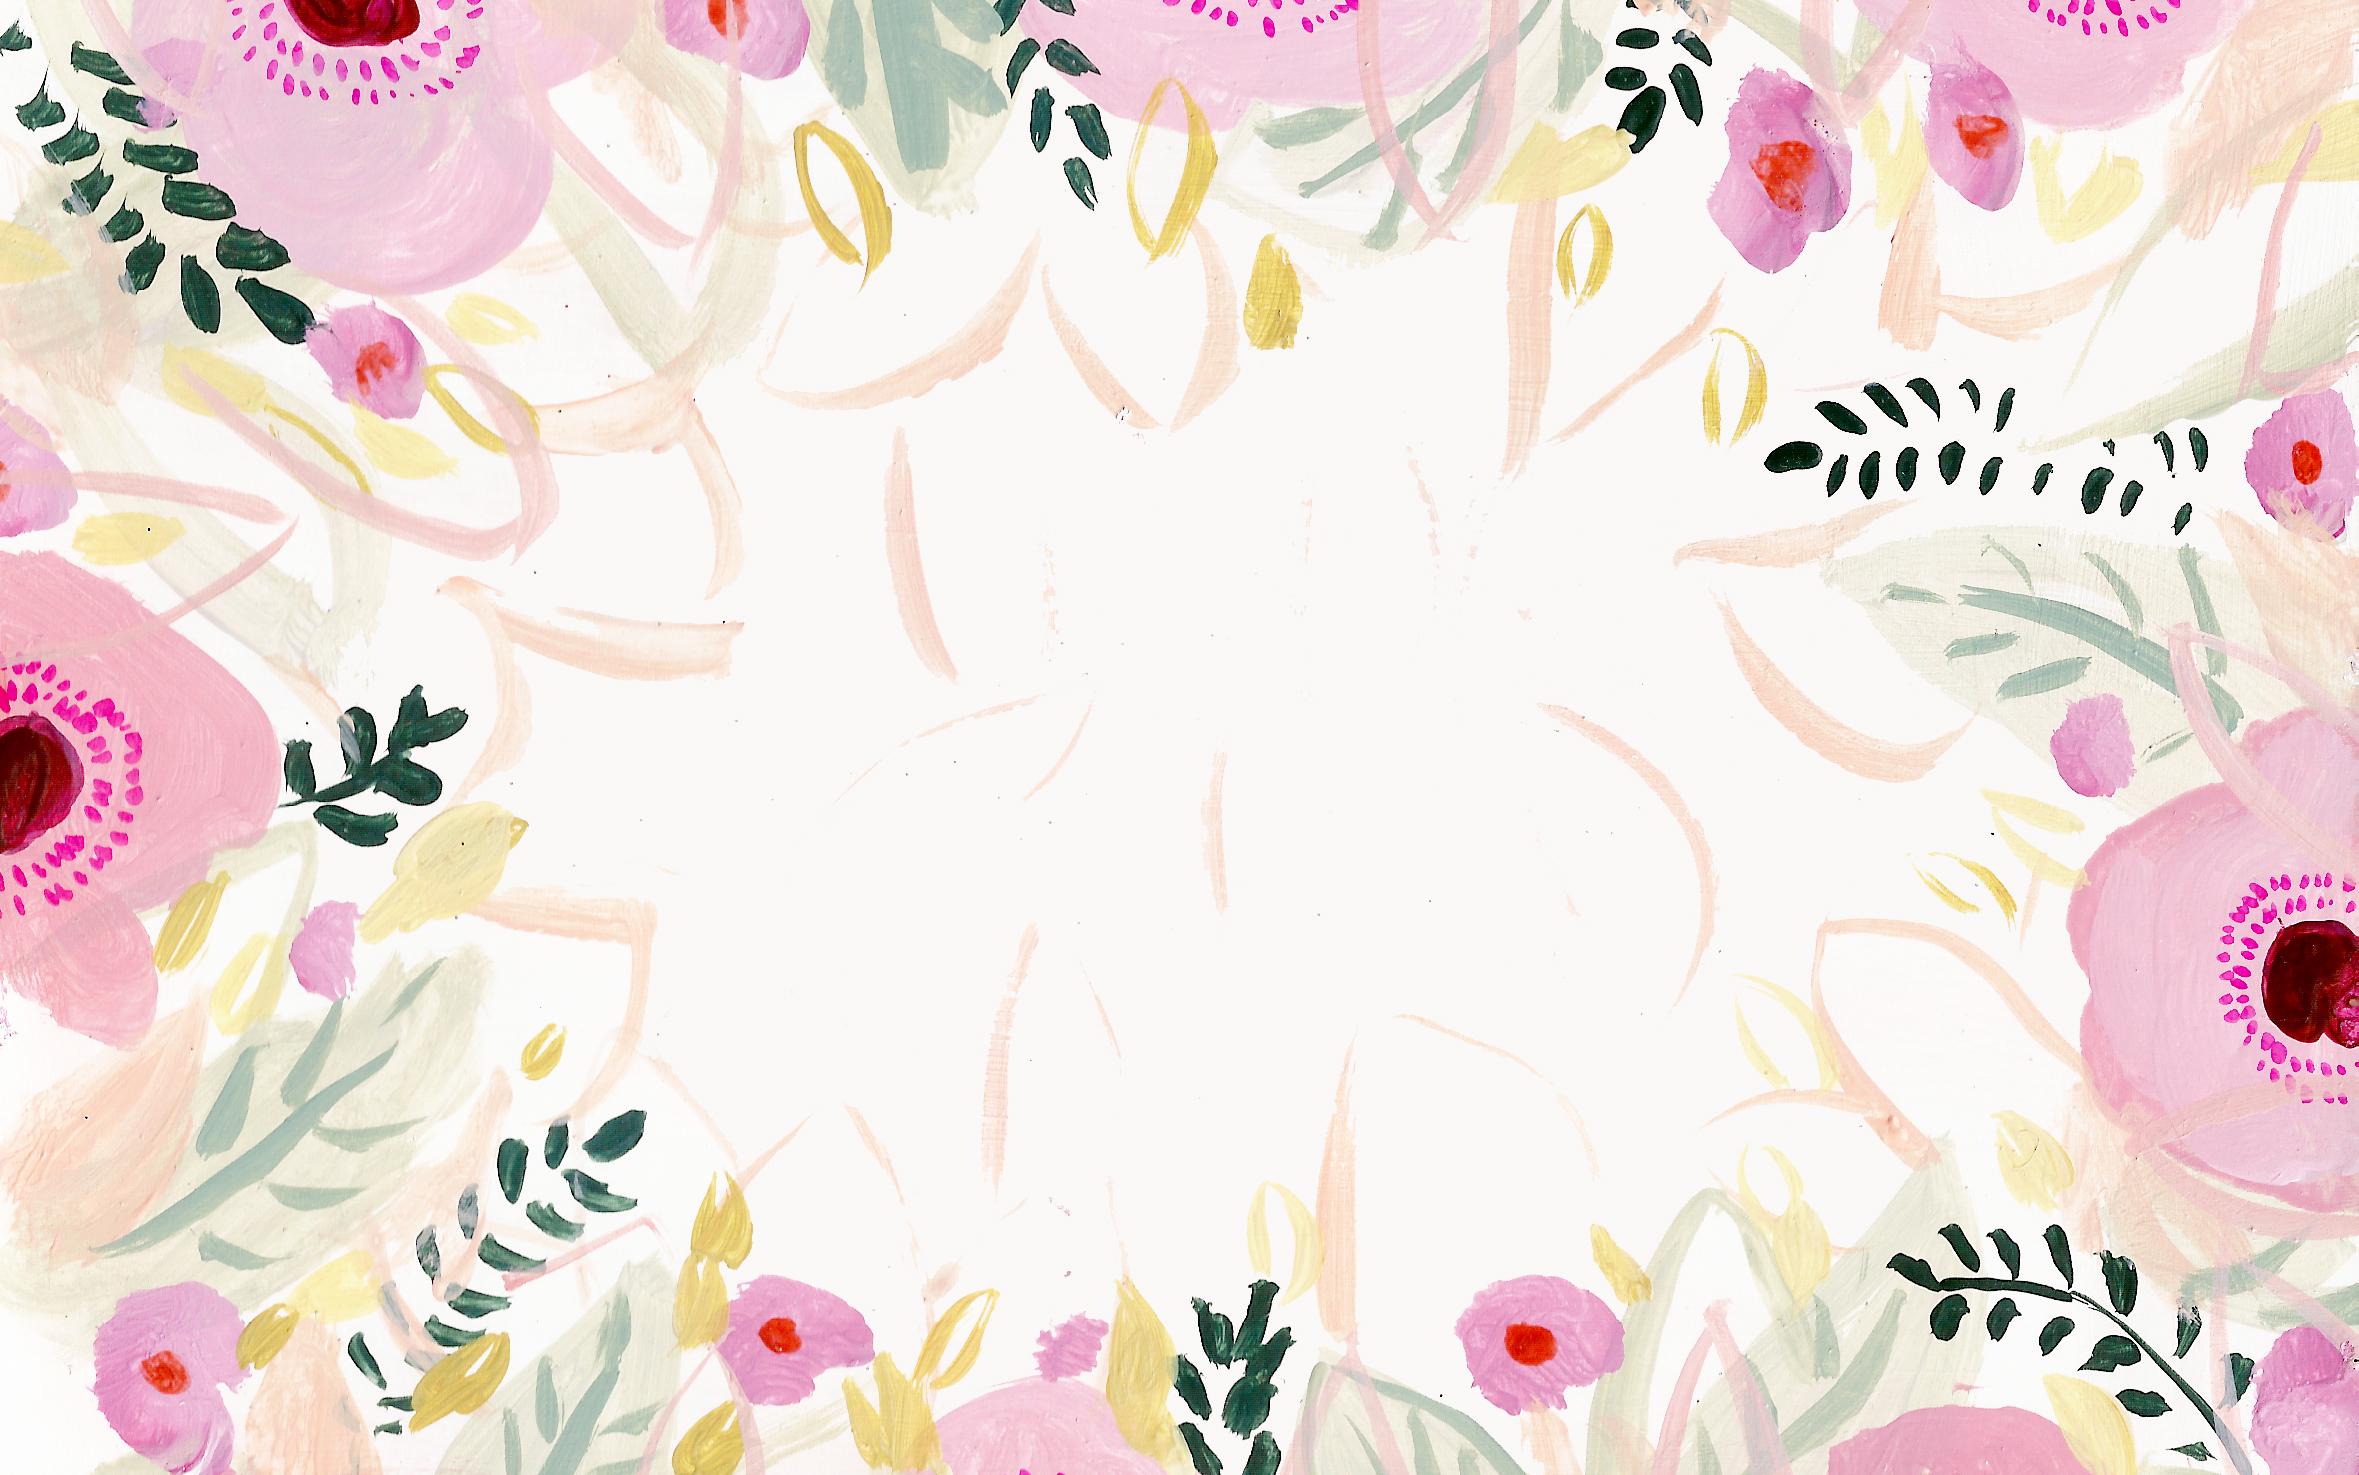 rifle paper co wallpaper pink flower desktop background